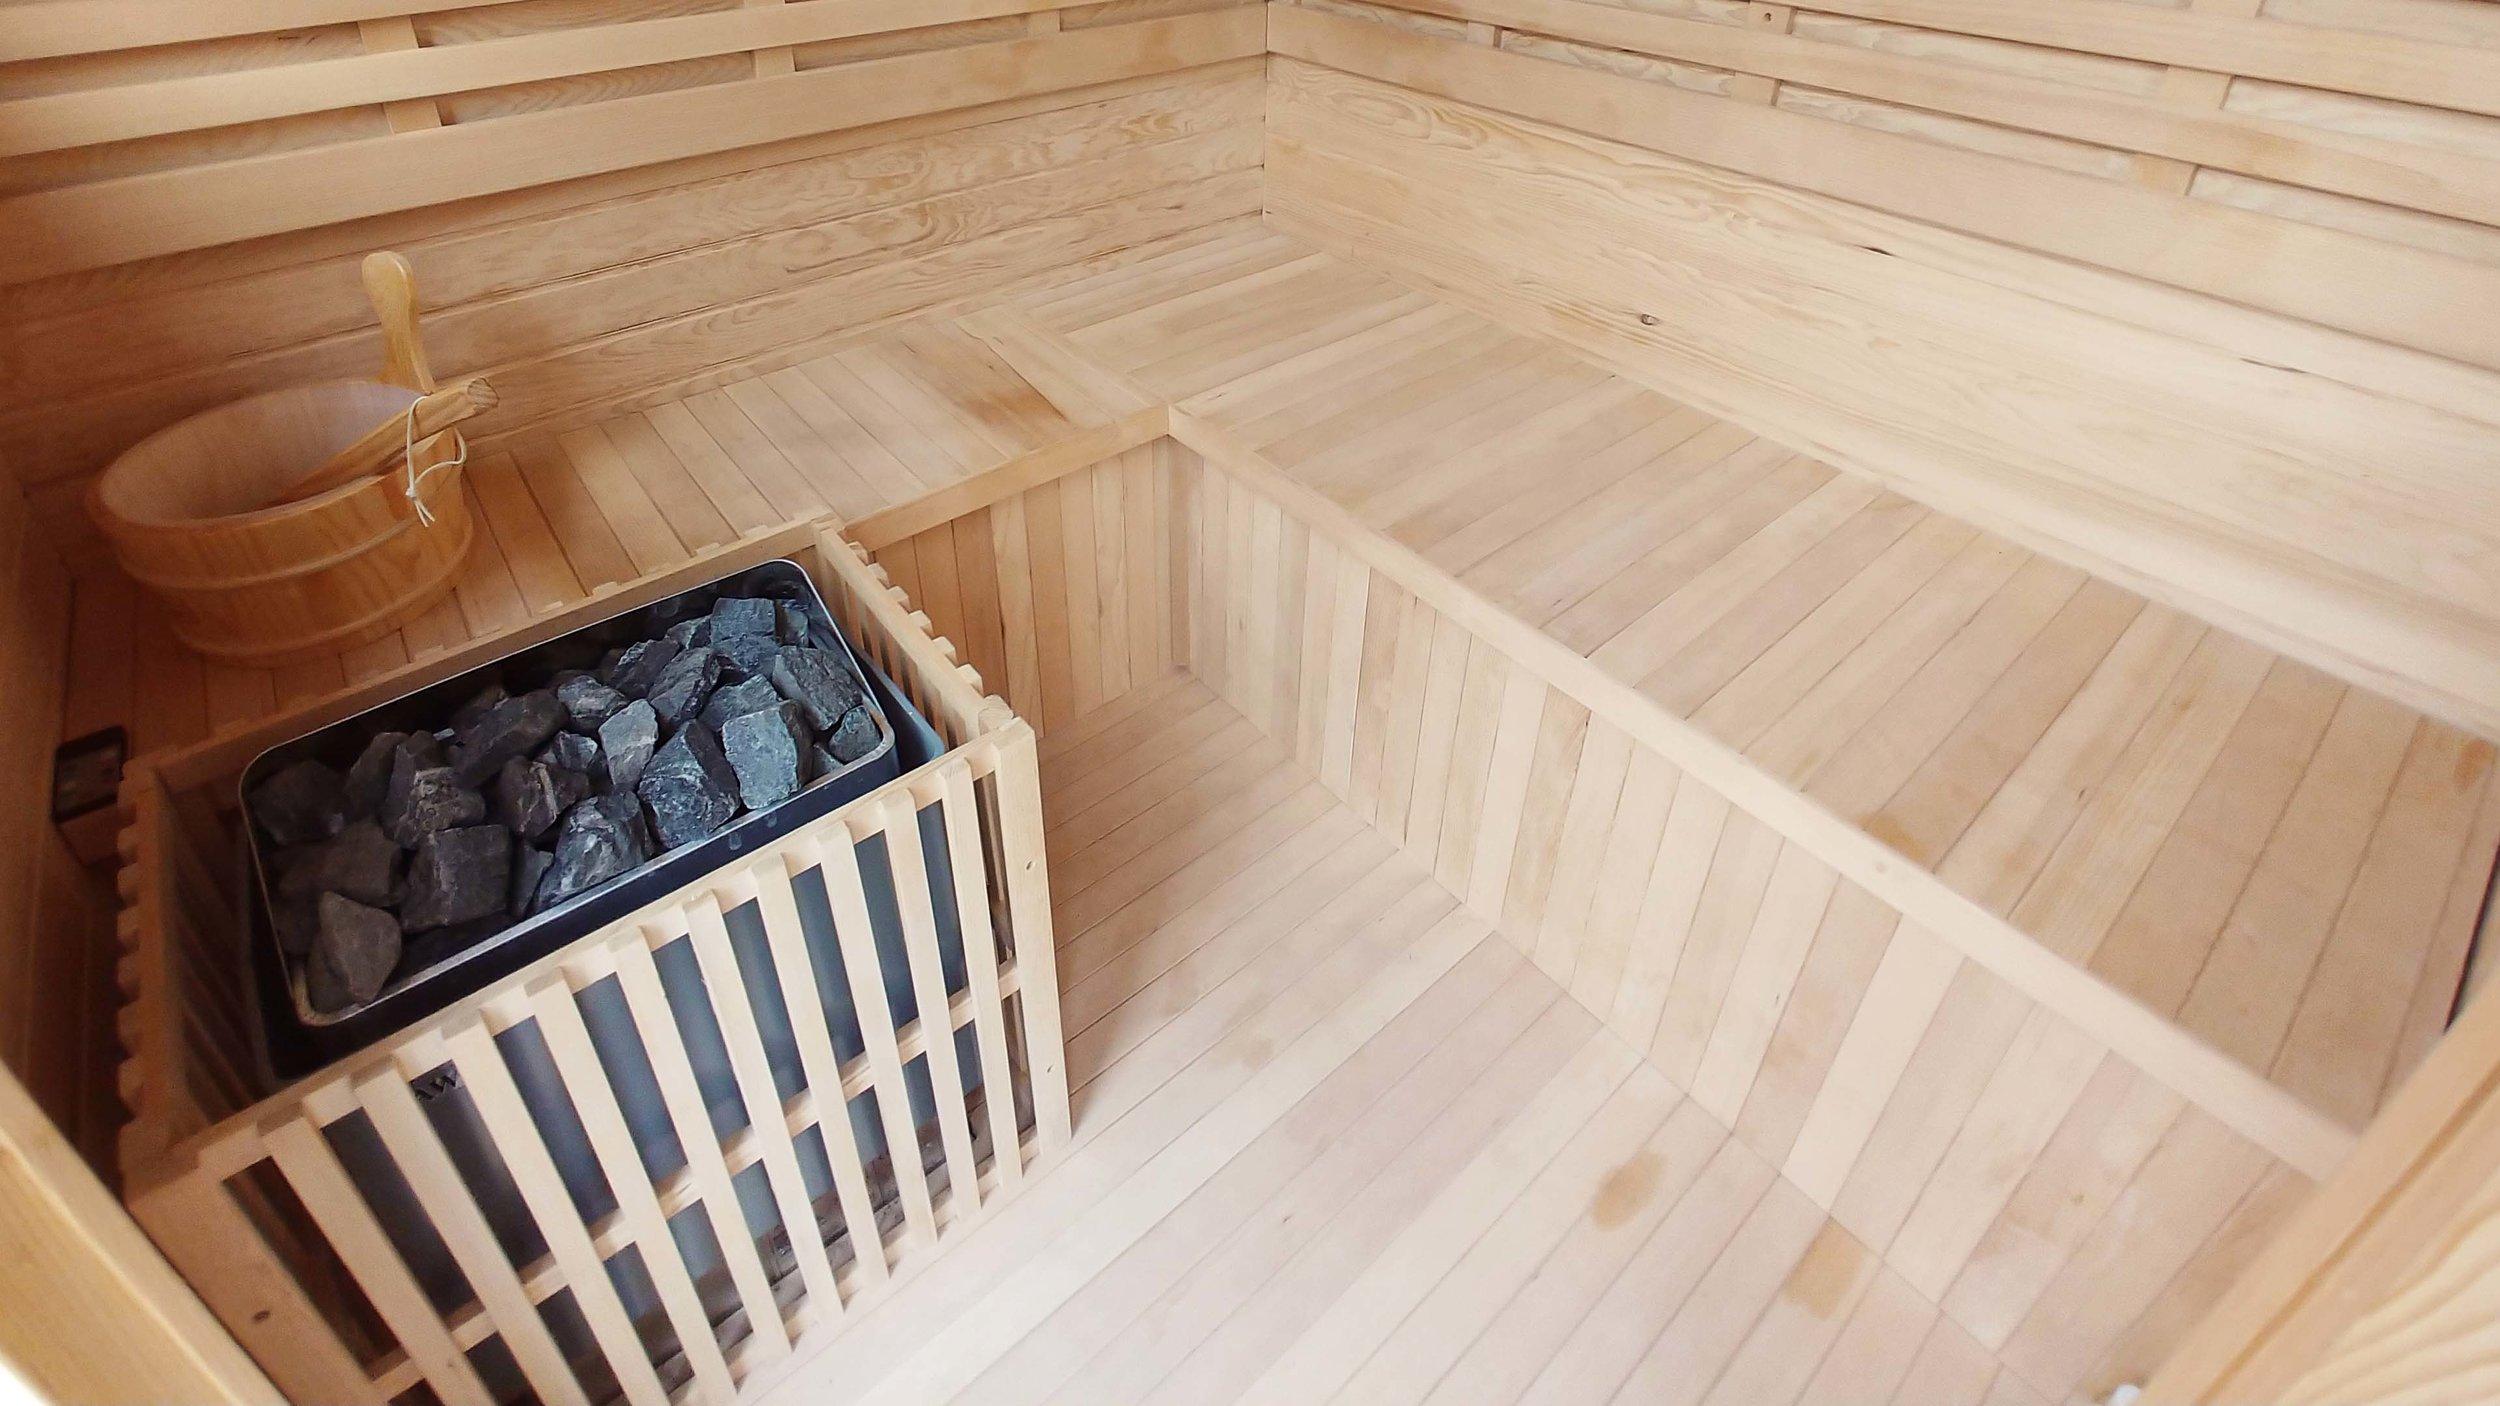 Garden Design Cheshire: Prairie Planting And Porcelain Patio: Sauna